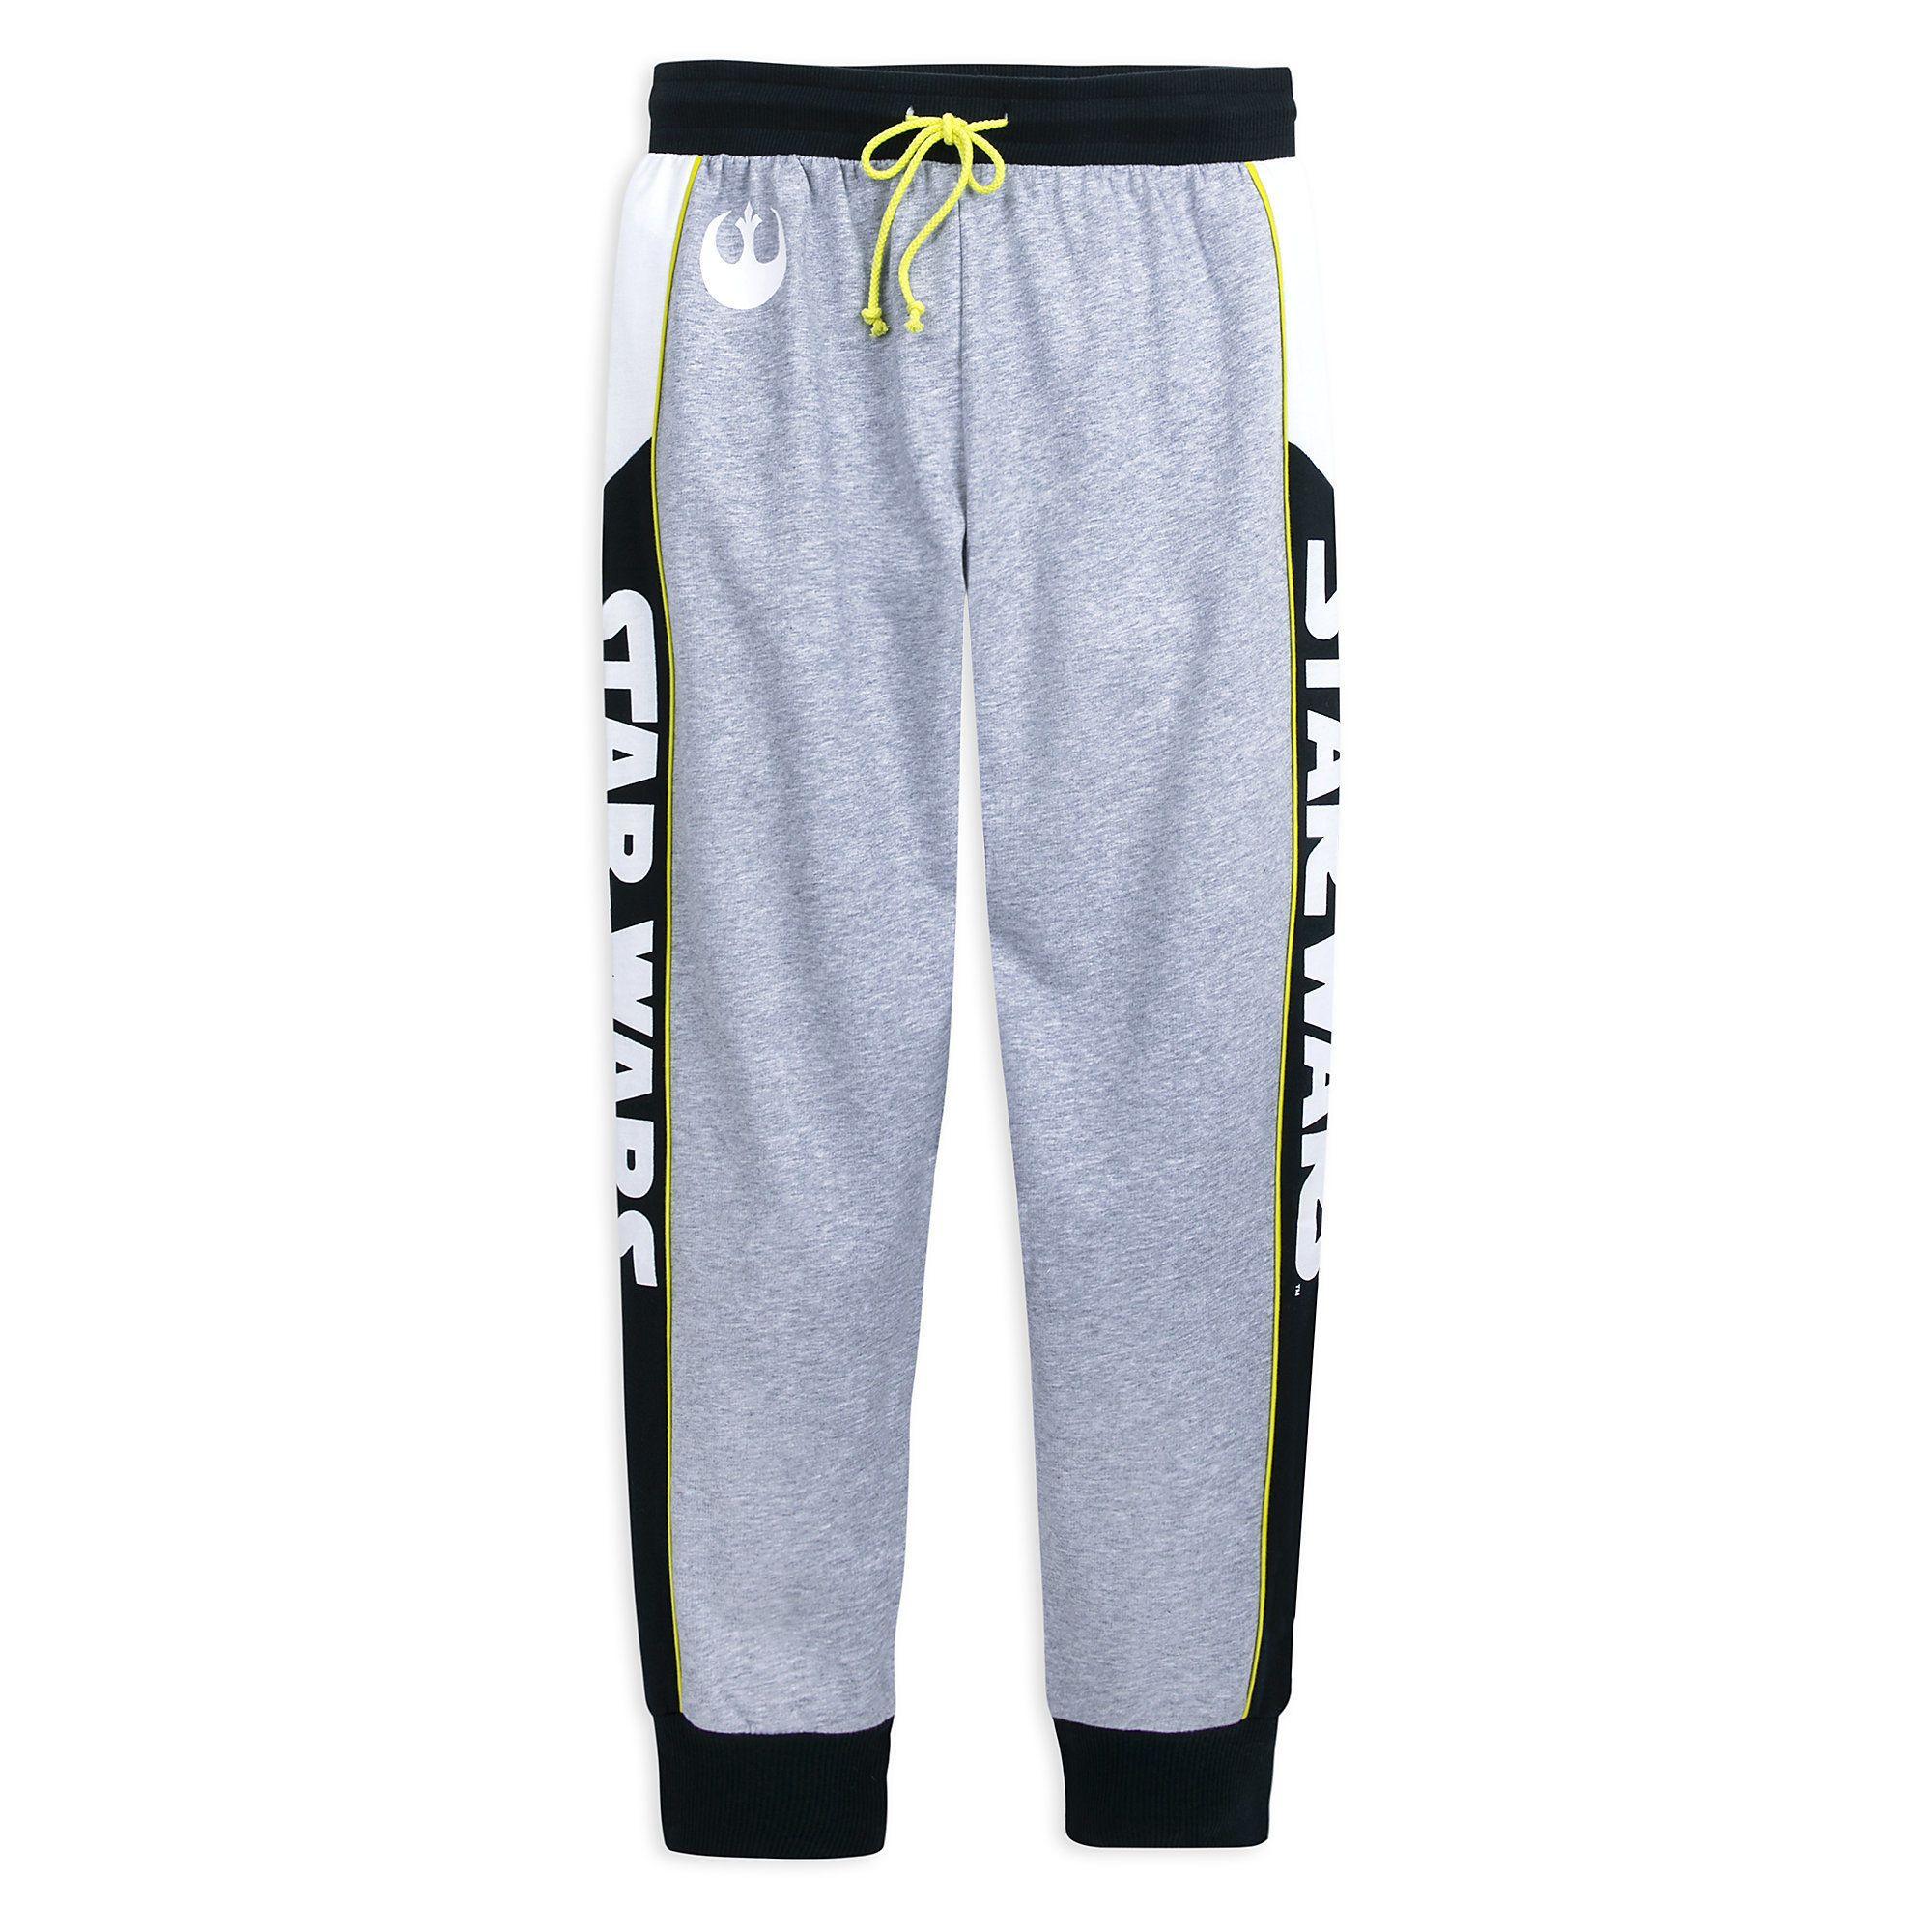 c9f4c31b58533 Women's Star Wars Sweatpants at Shop Disney ⭐️The Kessel Runway ⭐ Star Wars  fashion ⭐ Geek Fashion ⭐ Star Wars Style ⭐ Geek Chic ⭐️